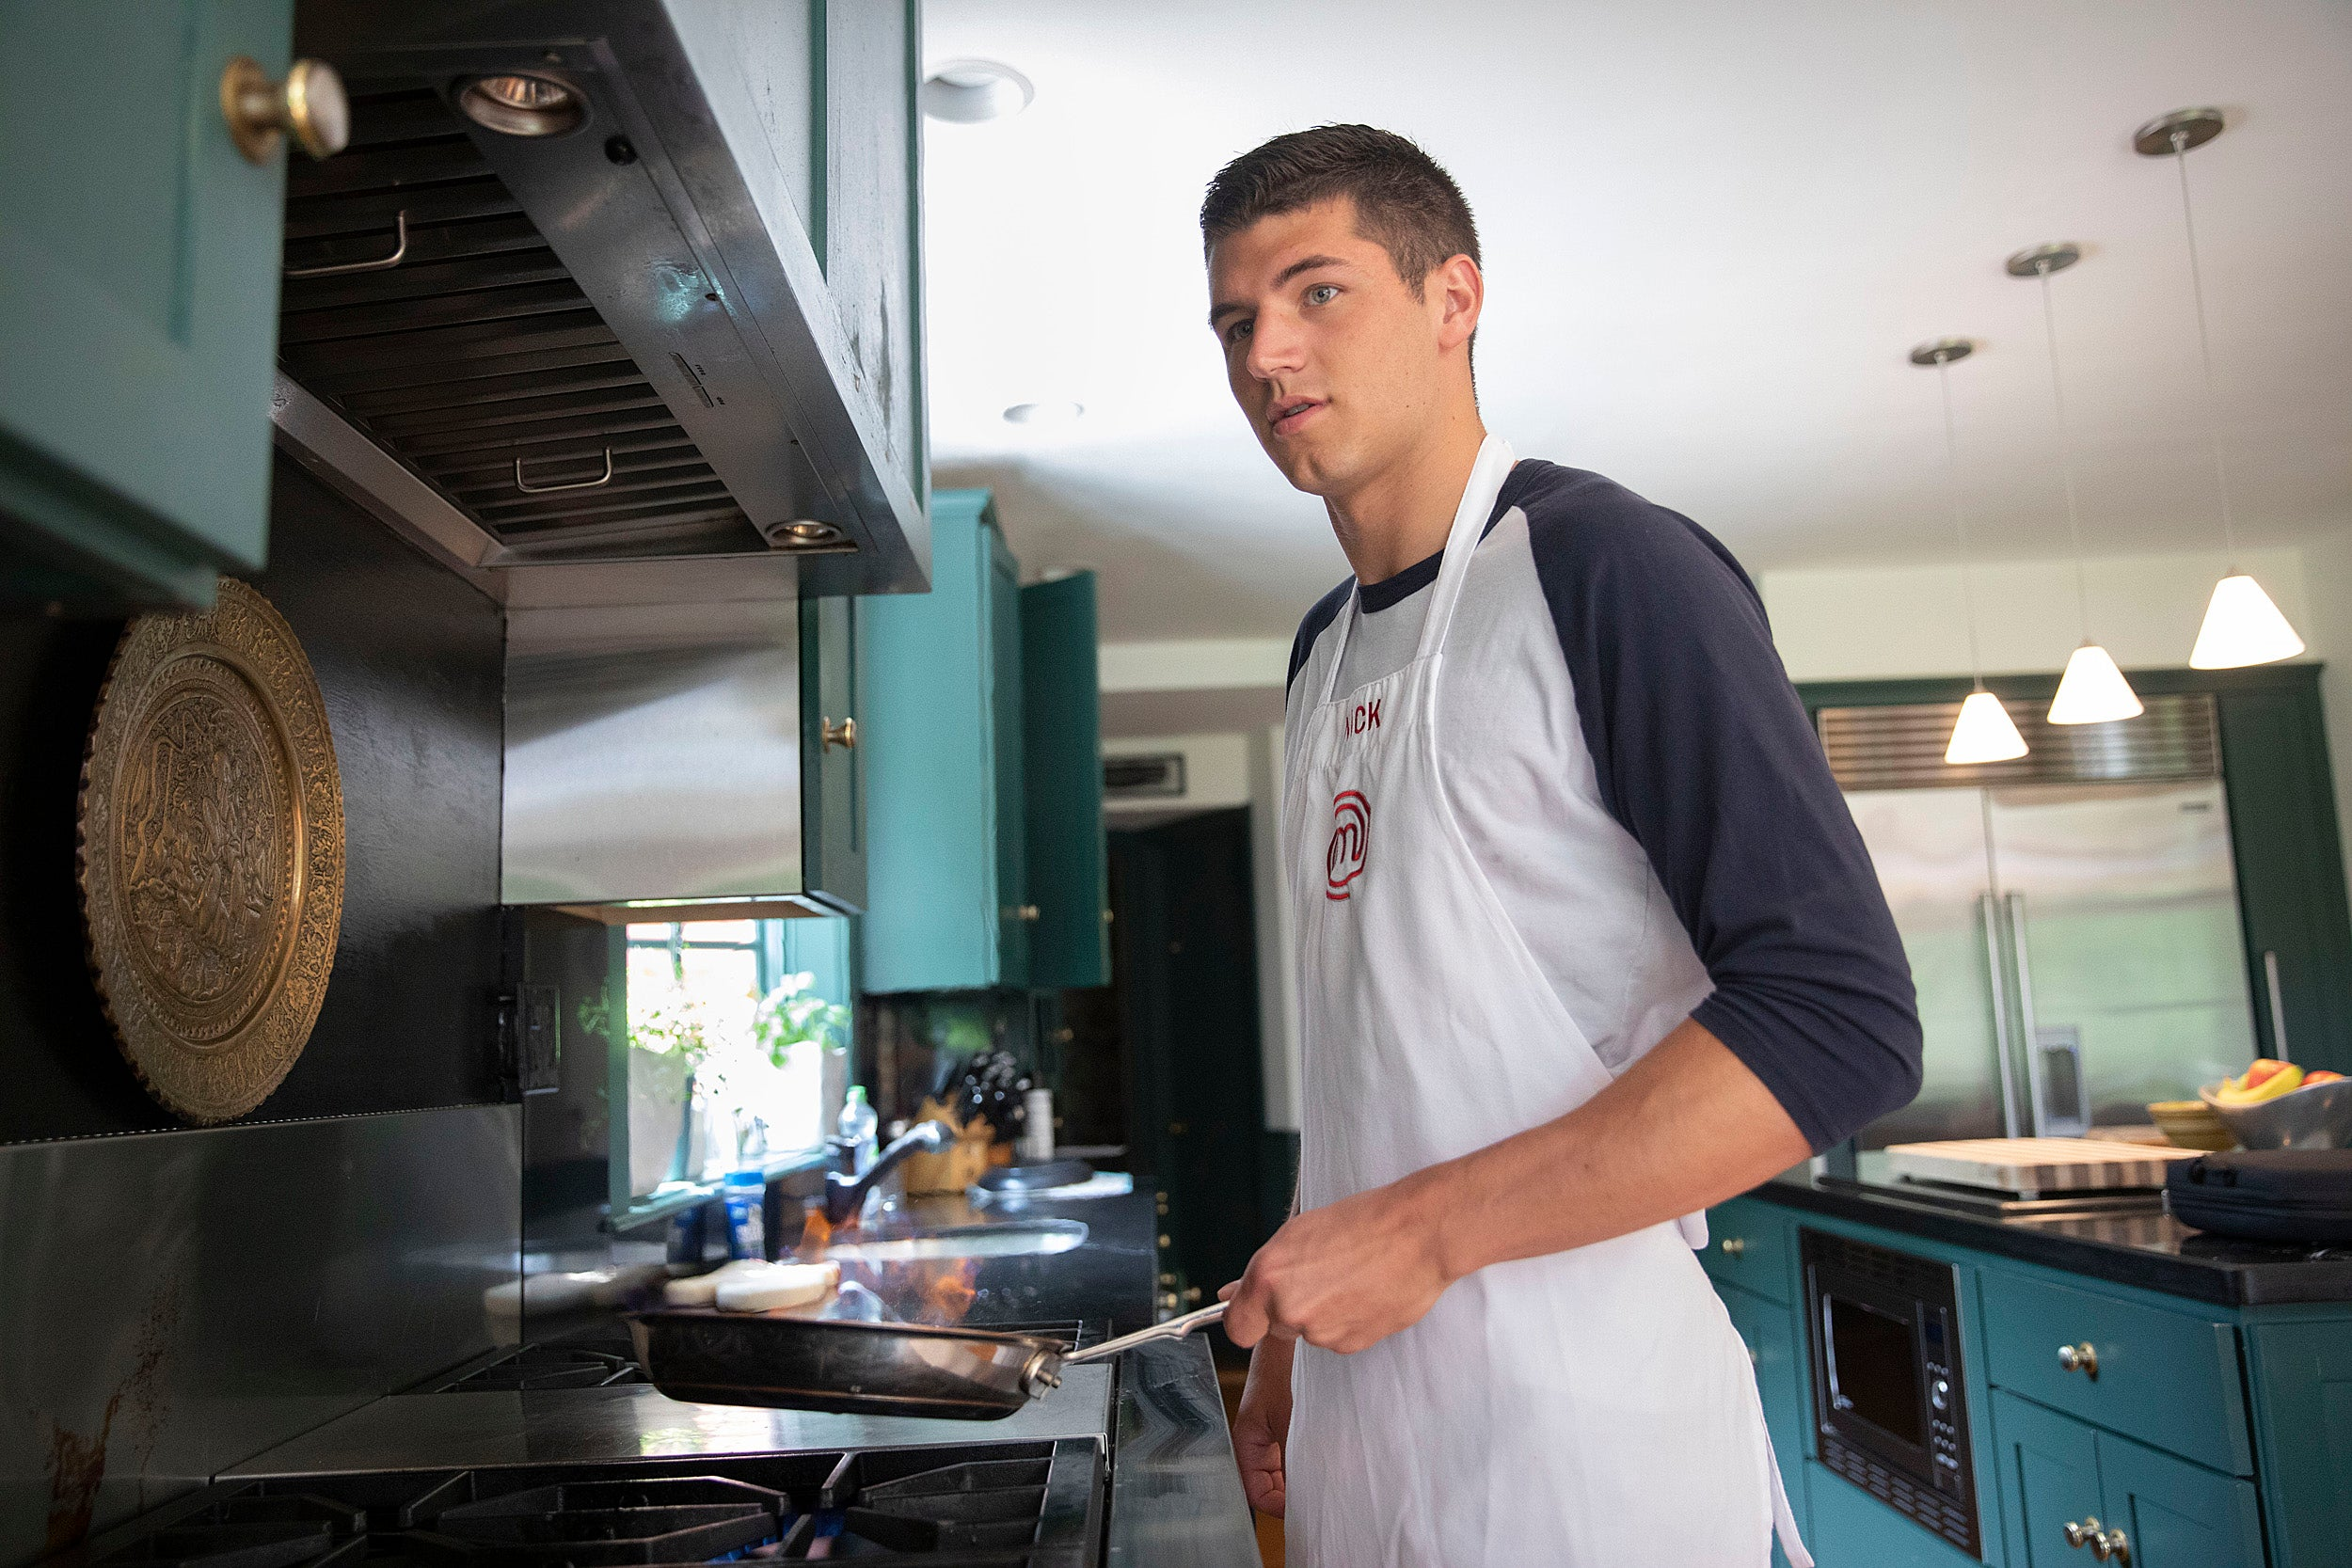 Nick DiGiovanni cooks at his home in Milton.